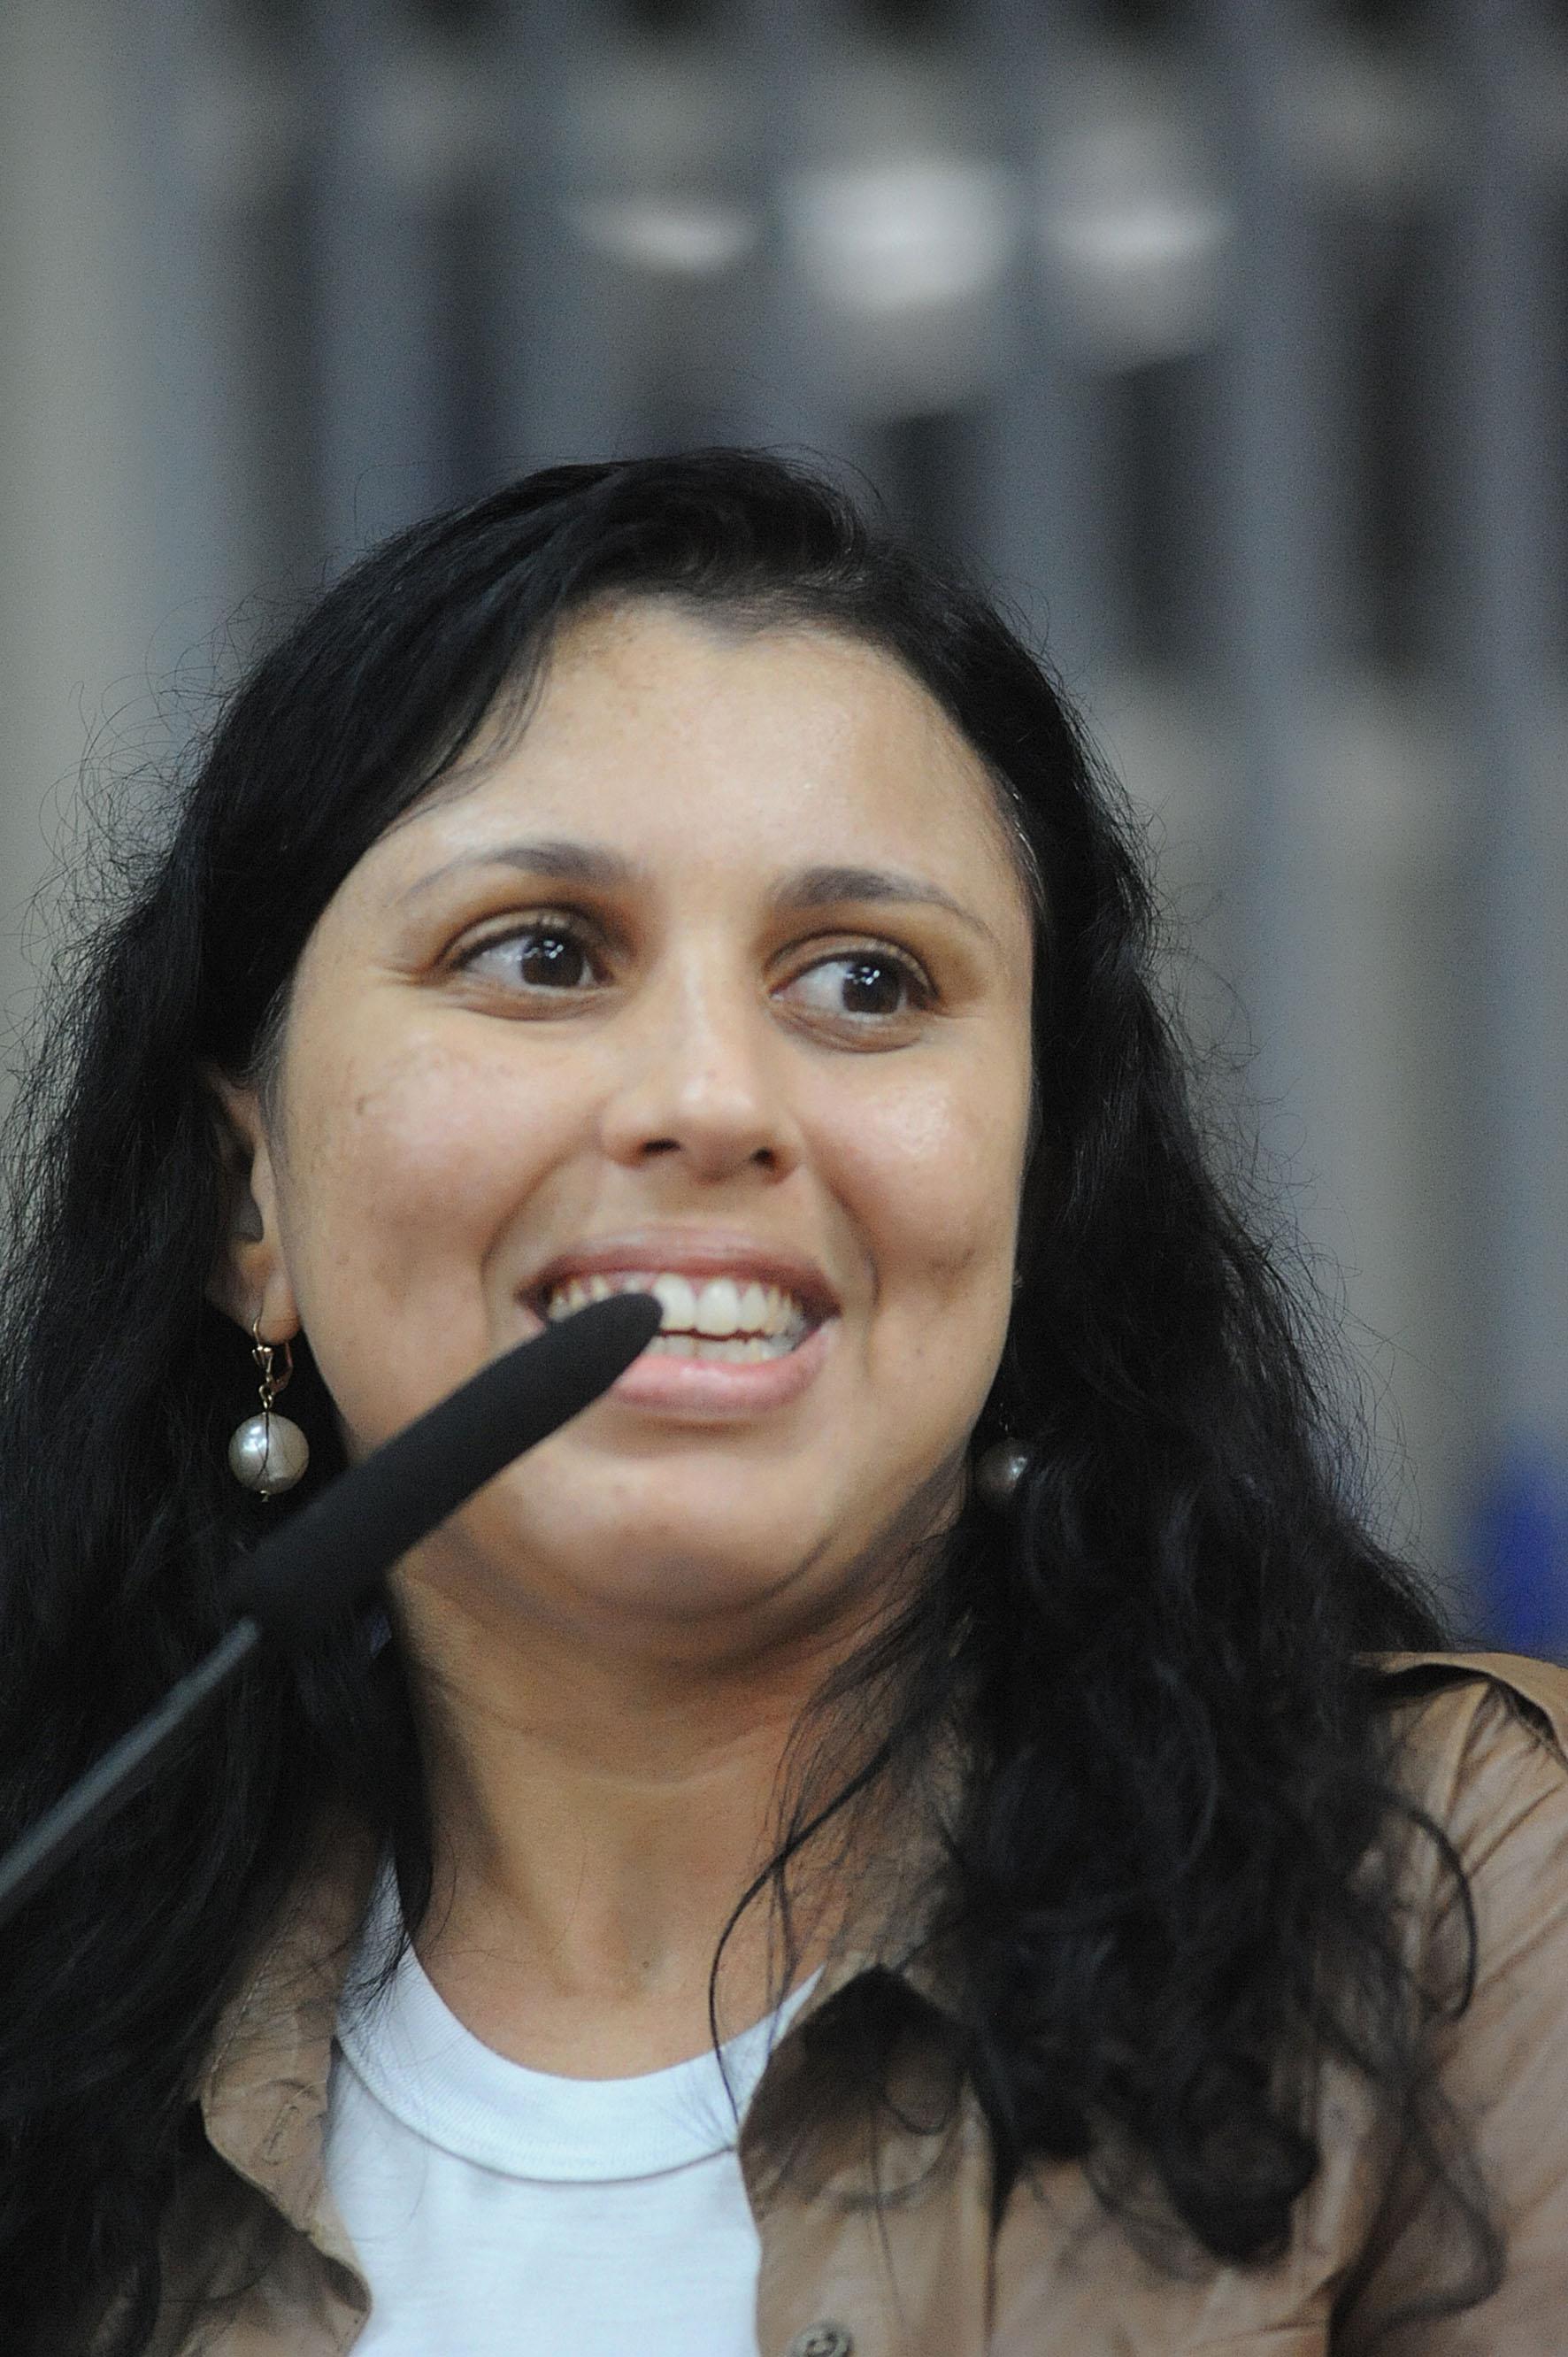 Daniela Fernandes de Almeida<a style='float:right' href='https://www3.al.sp.gov.br/repositorio/noticia/N-06-2016/fg191970.jpg' target=_blank><img src='/_img/material-file-download-white.png' width='14px' alt='Clique para baixar a imagem'></a>